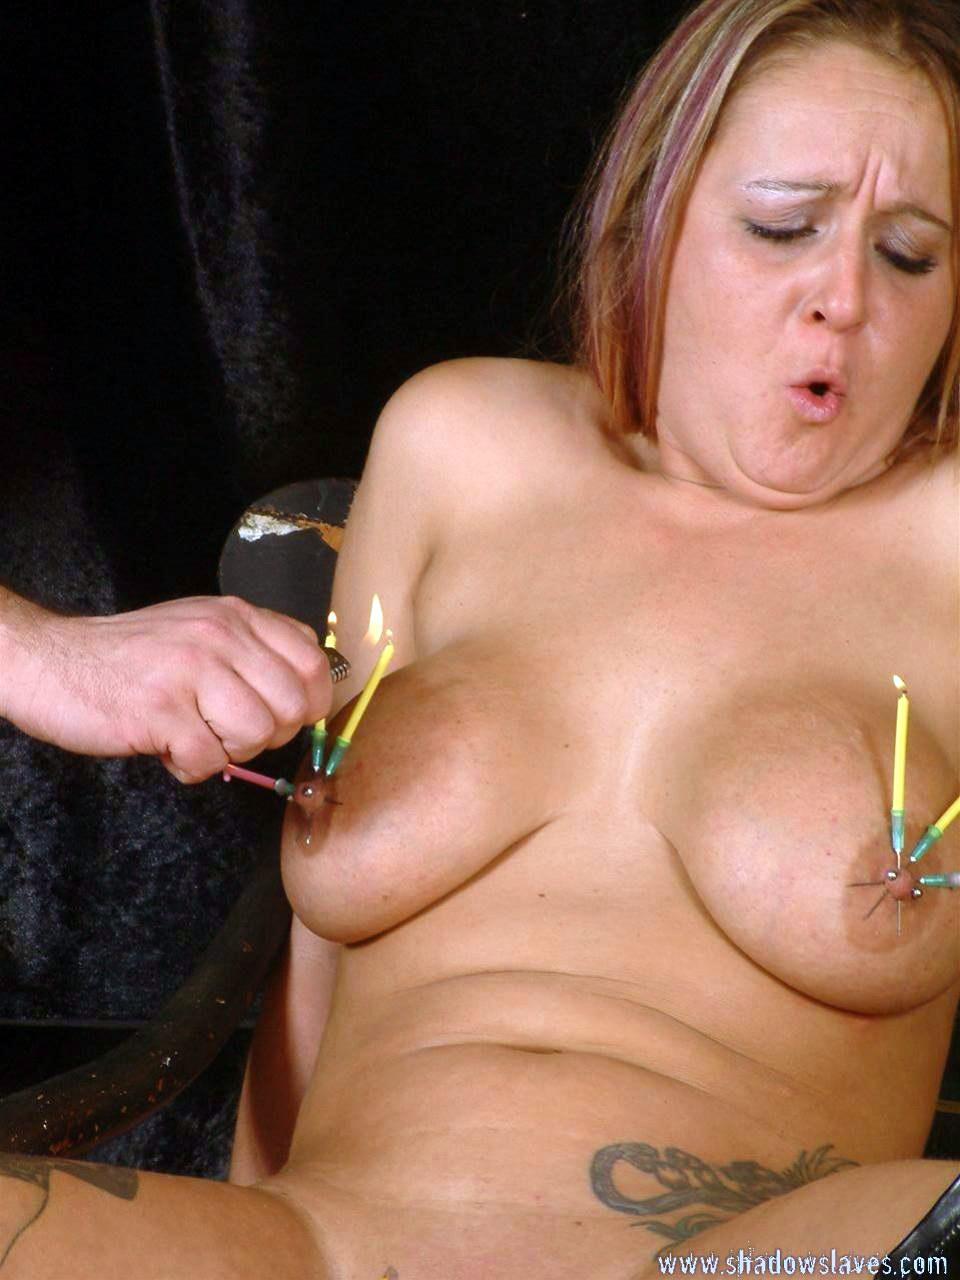 Big boob milf seduction